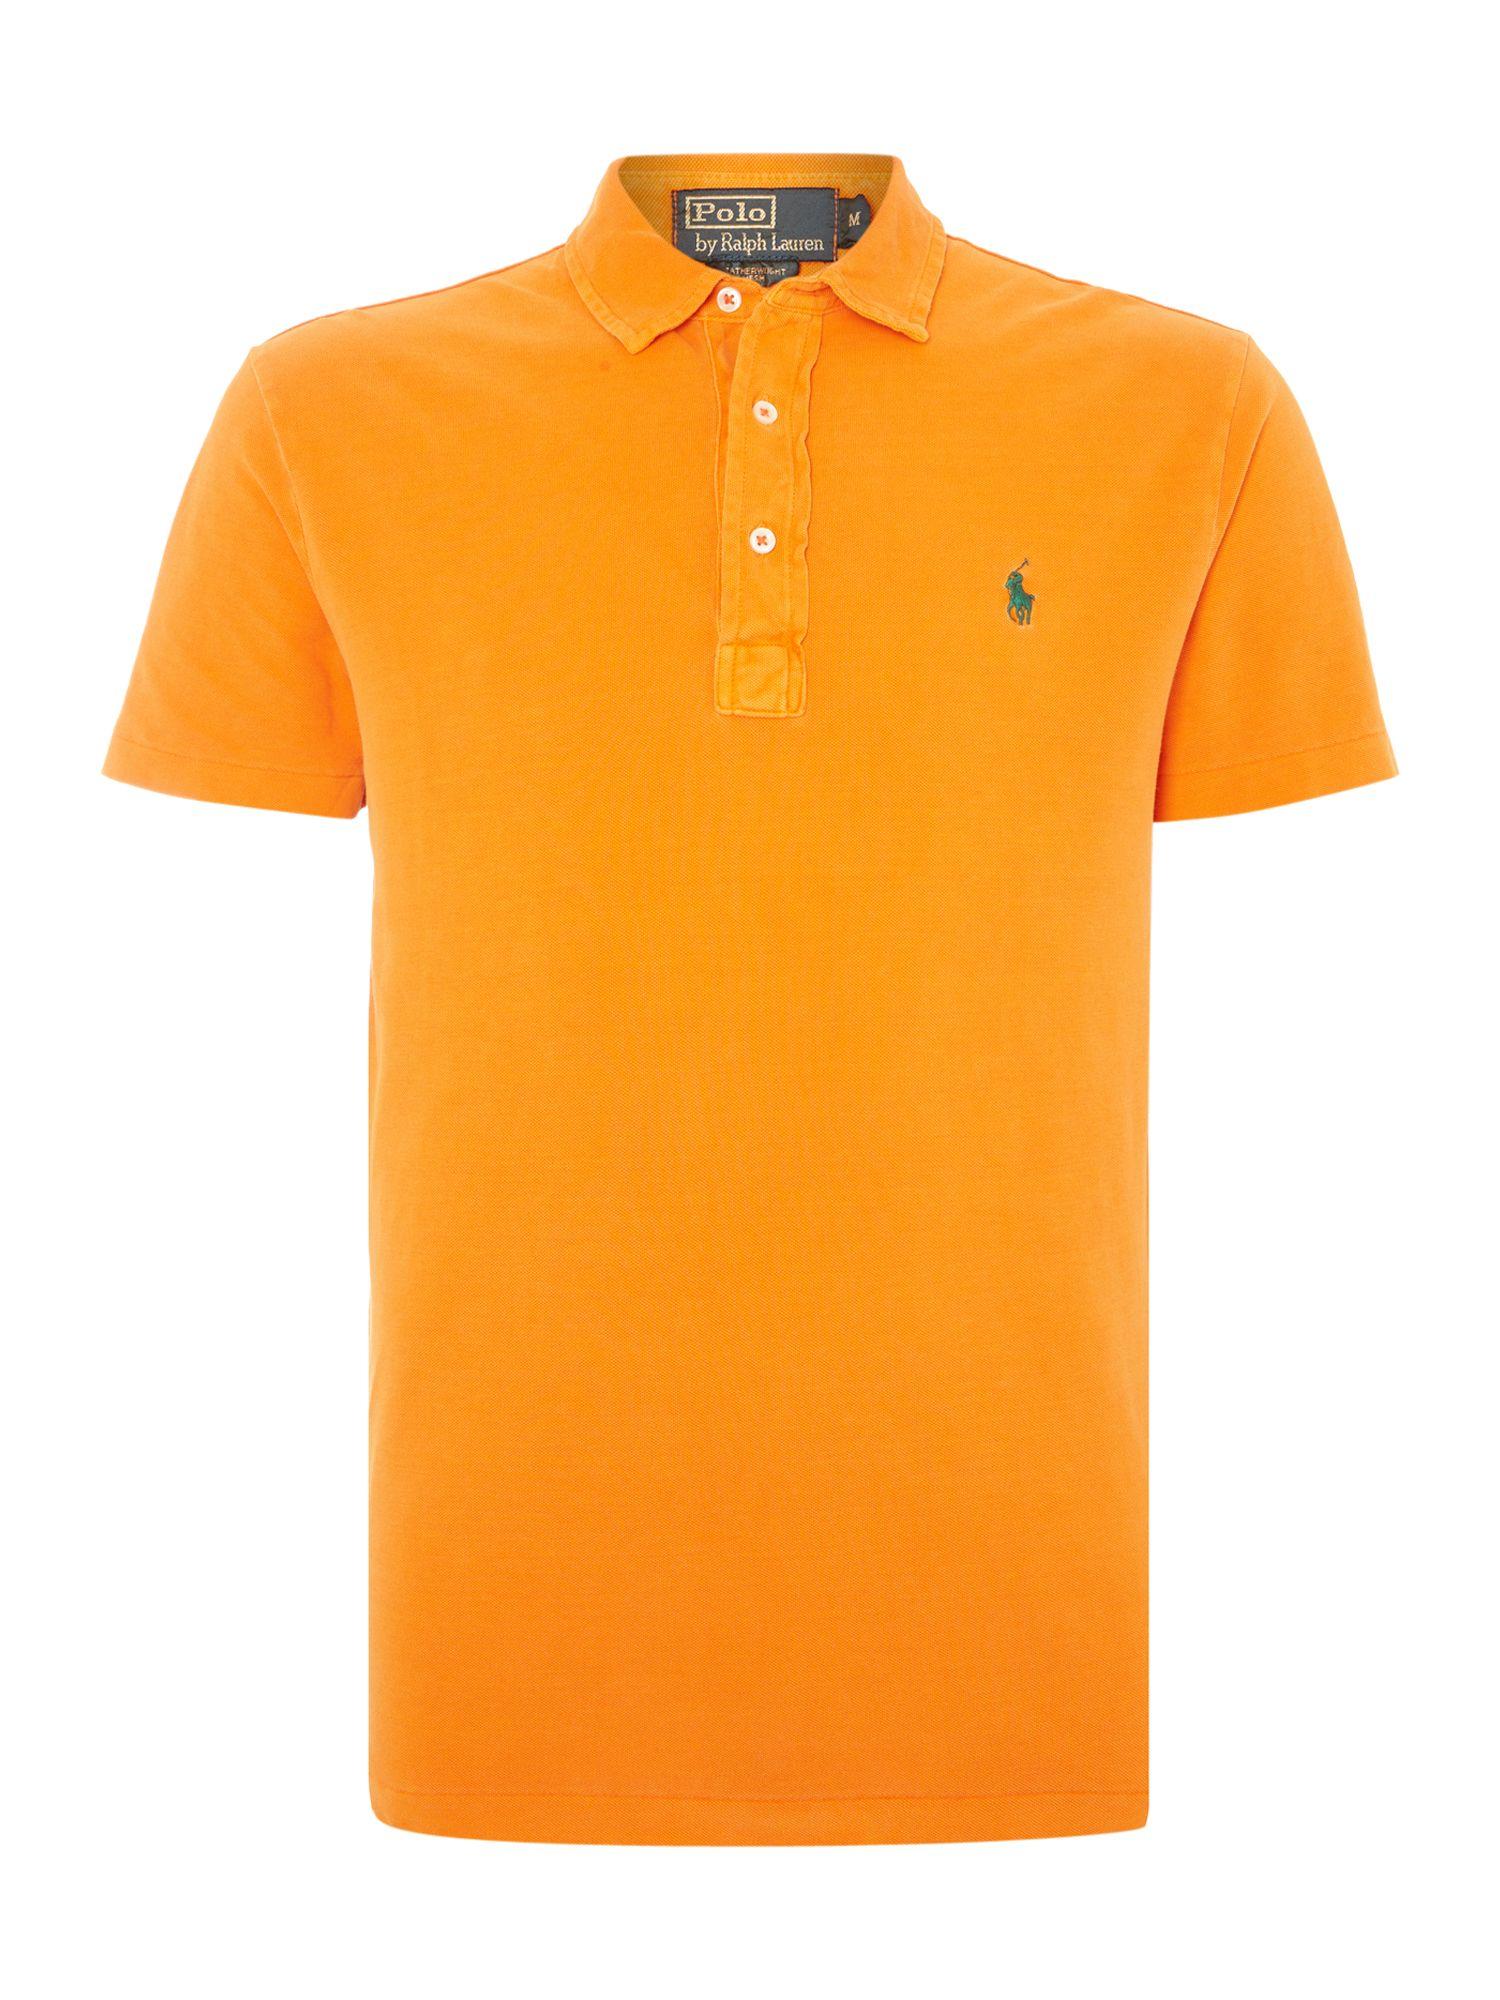 Polo ralph lauren custom fit end placket polo shirt in for Polo ralph lauren custom fit polo shirt